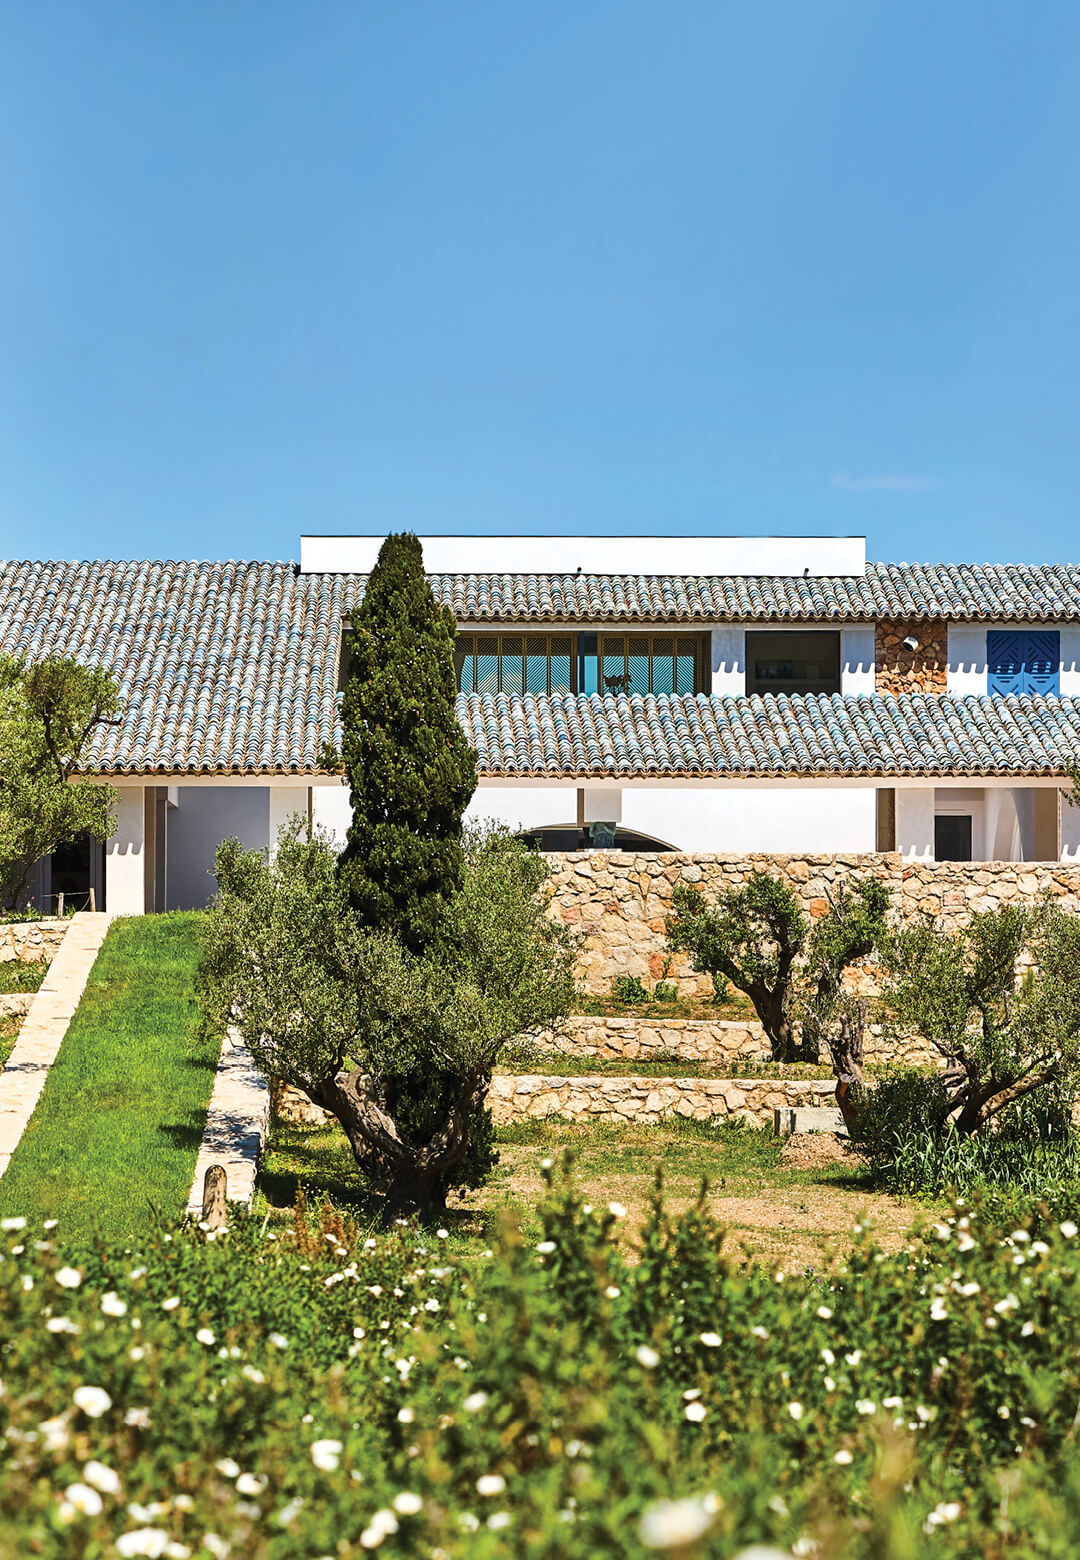 The villa houses the expansive collection of contemporary art of the Fondation Carmignac, founded by French entrepreneur Édouard Carmignac | Fondation Carmignac | Atelier Barani, GMAA agency and Louis Benech | STIRworld